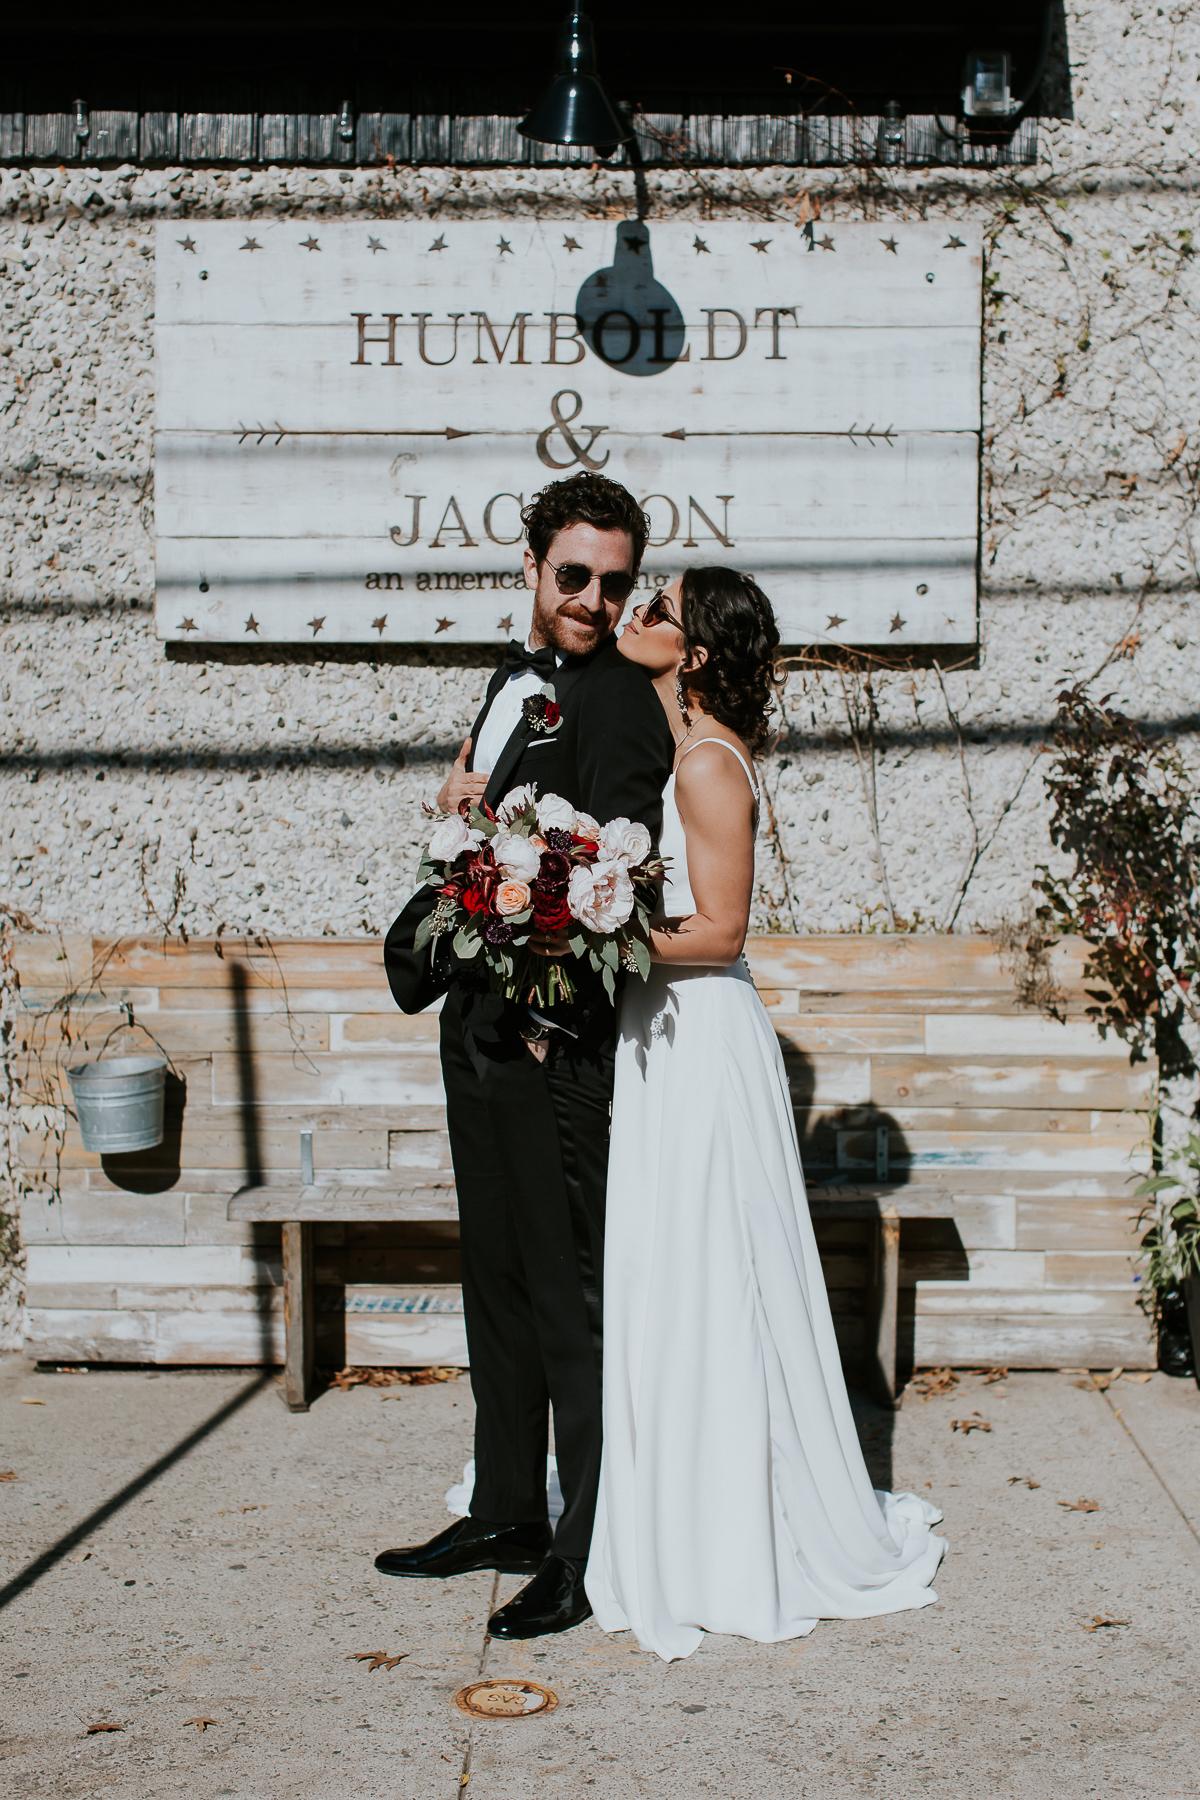 Humboldt-&-Jackson-Restaurant-Intimate-Brooklyn-Documentary-Wedding-Photographer-41.jpg